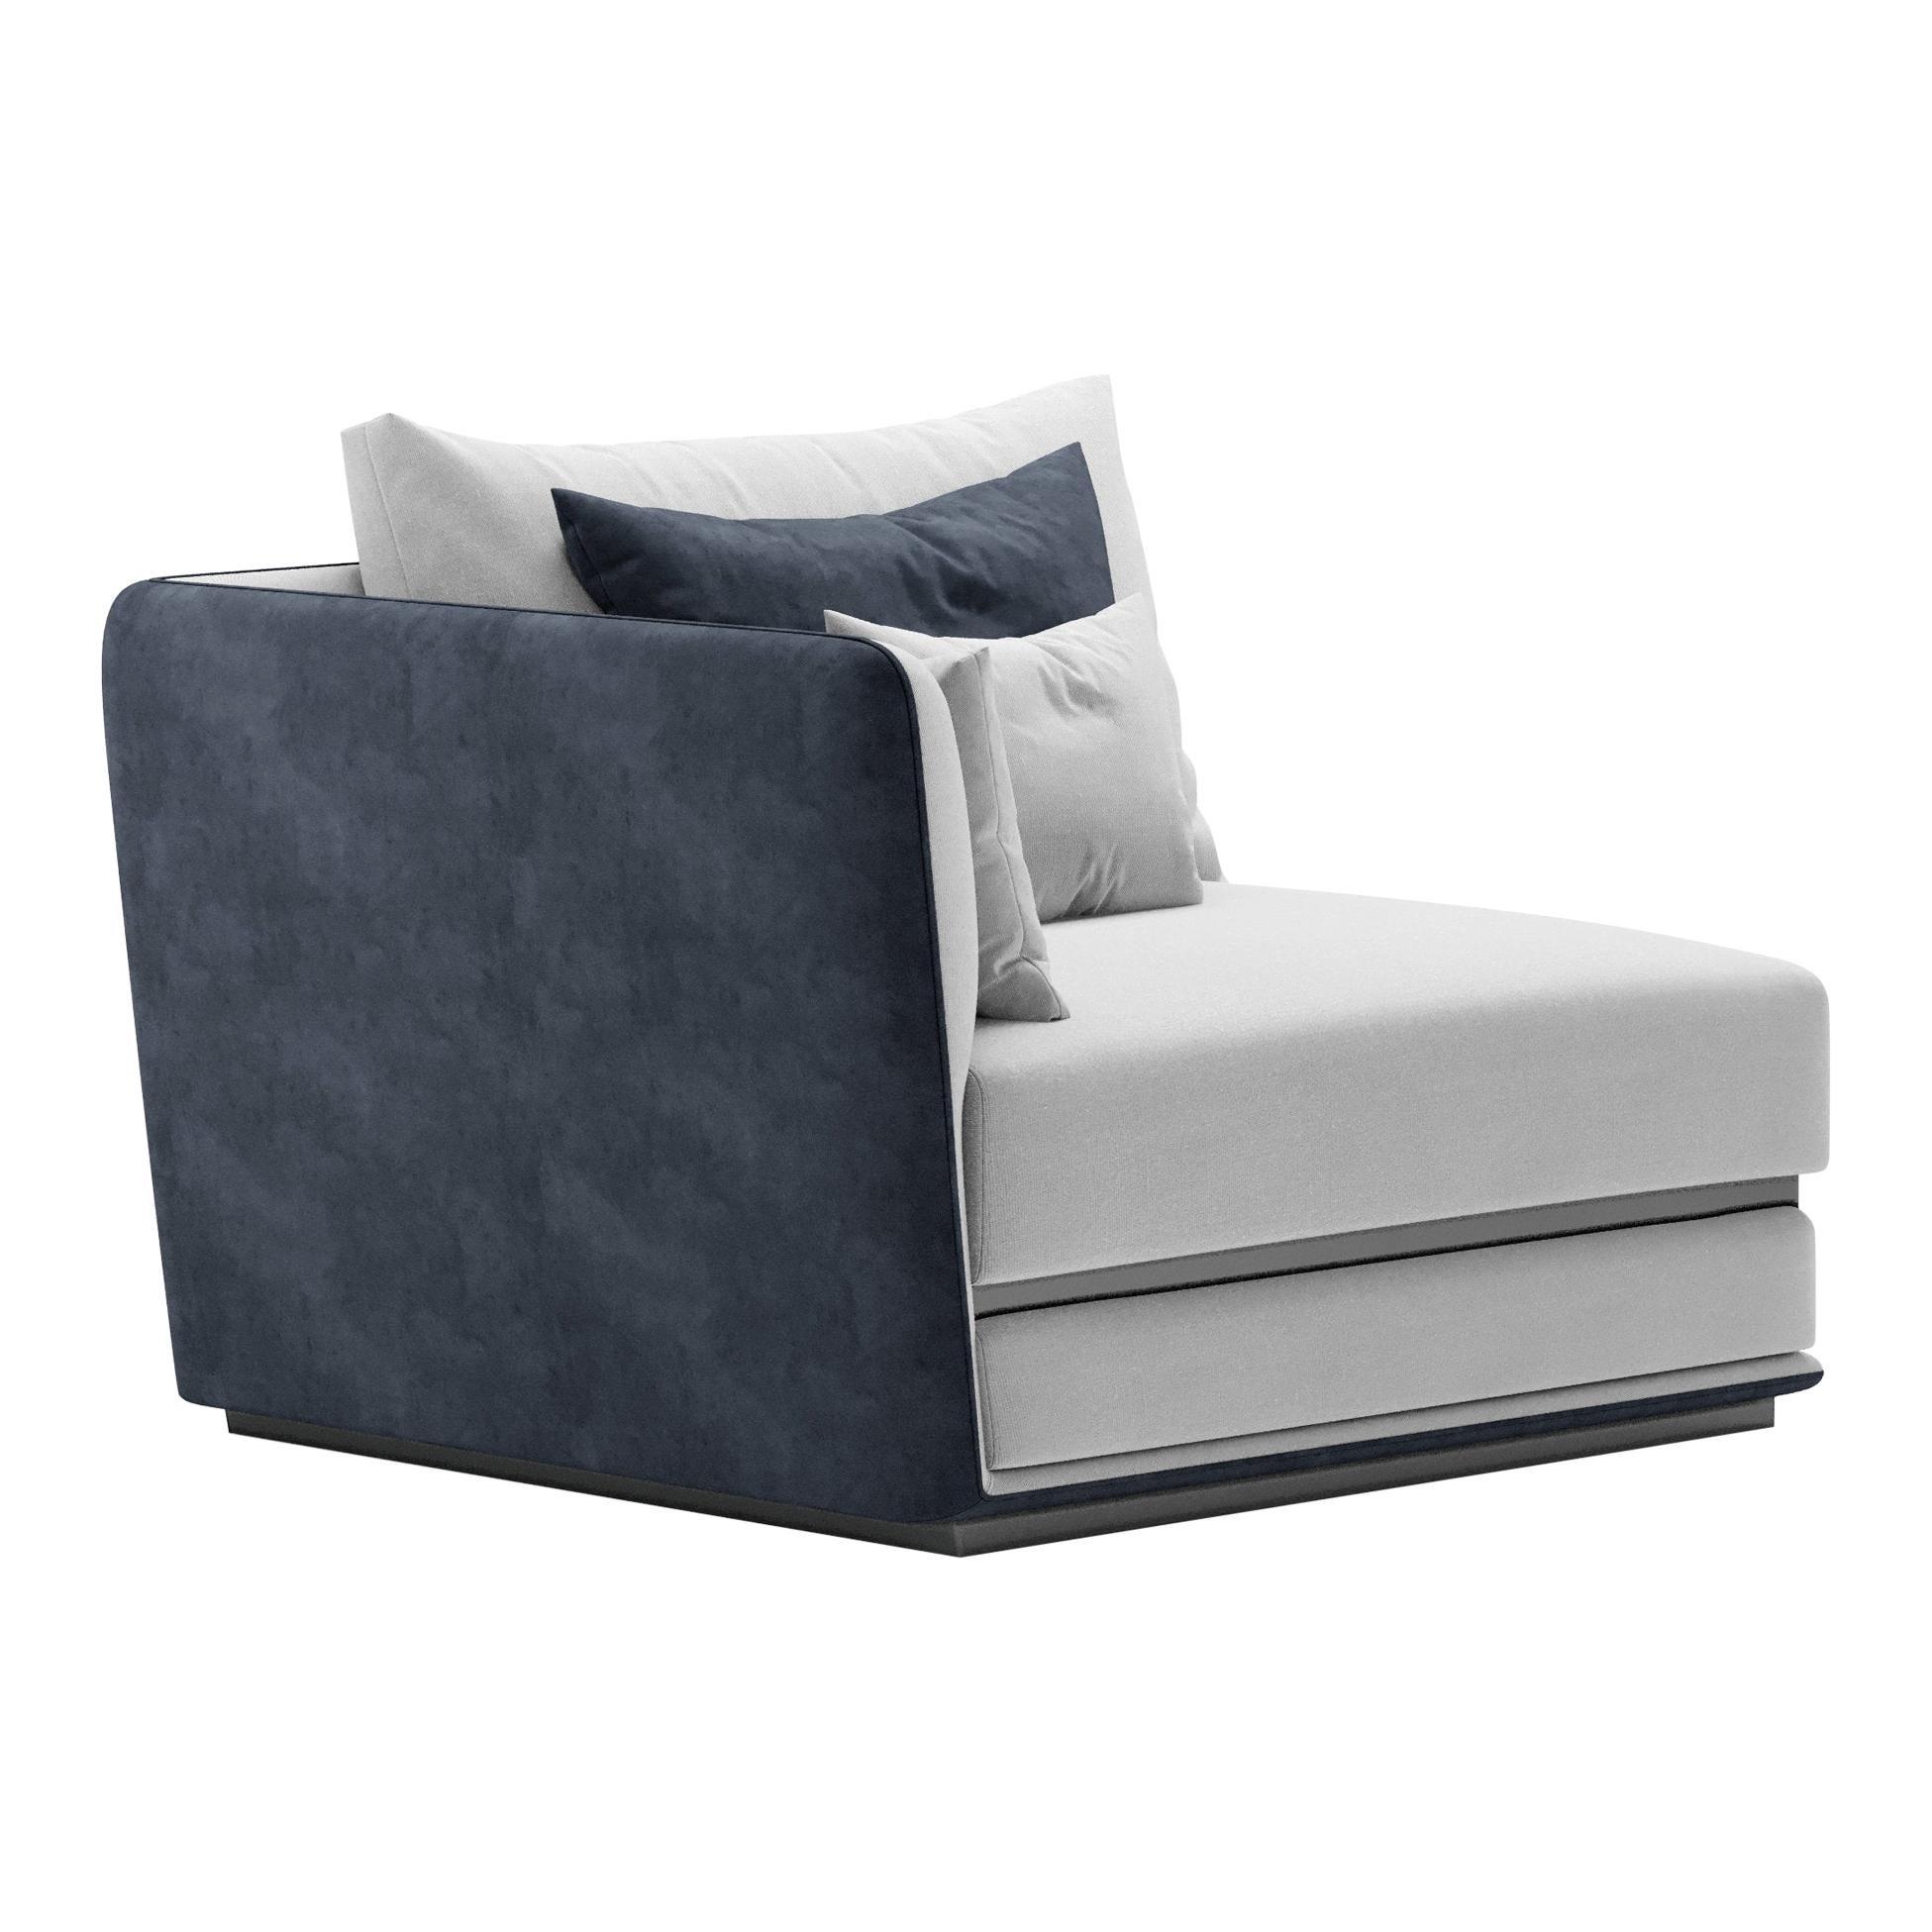 Right/Left Arm Single Geometric Modular Sofa by Fabio Arcaini Settee Velvet